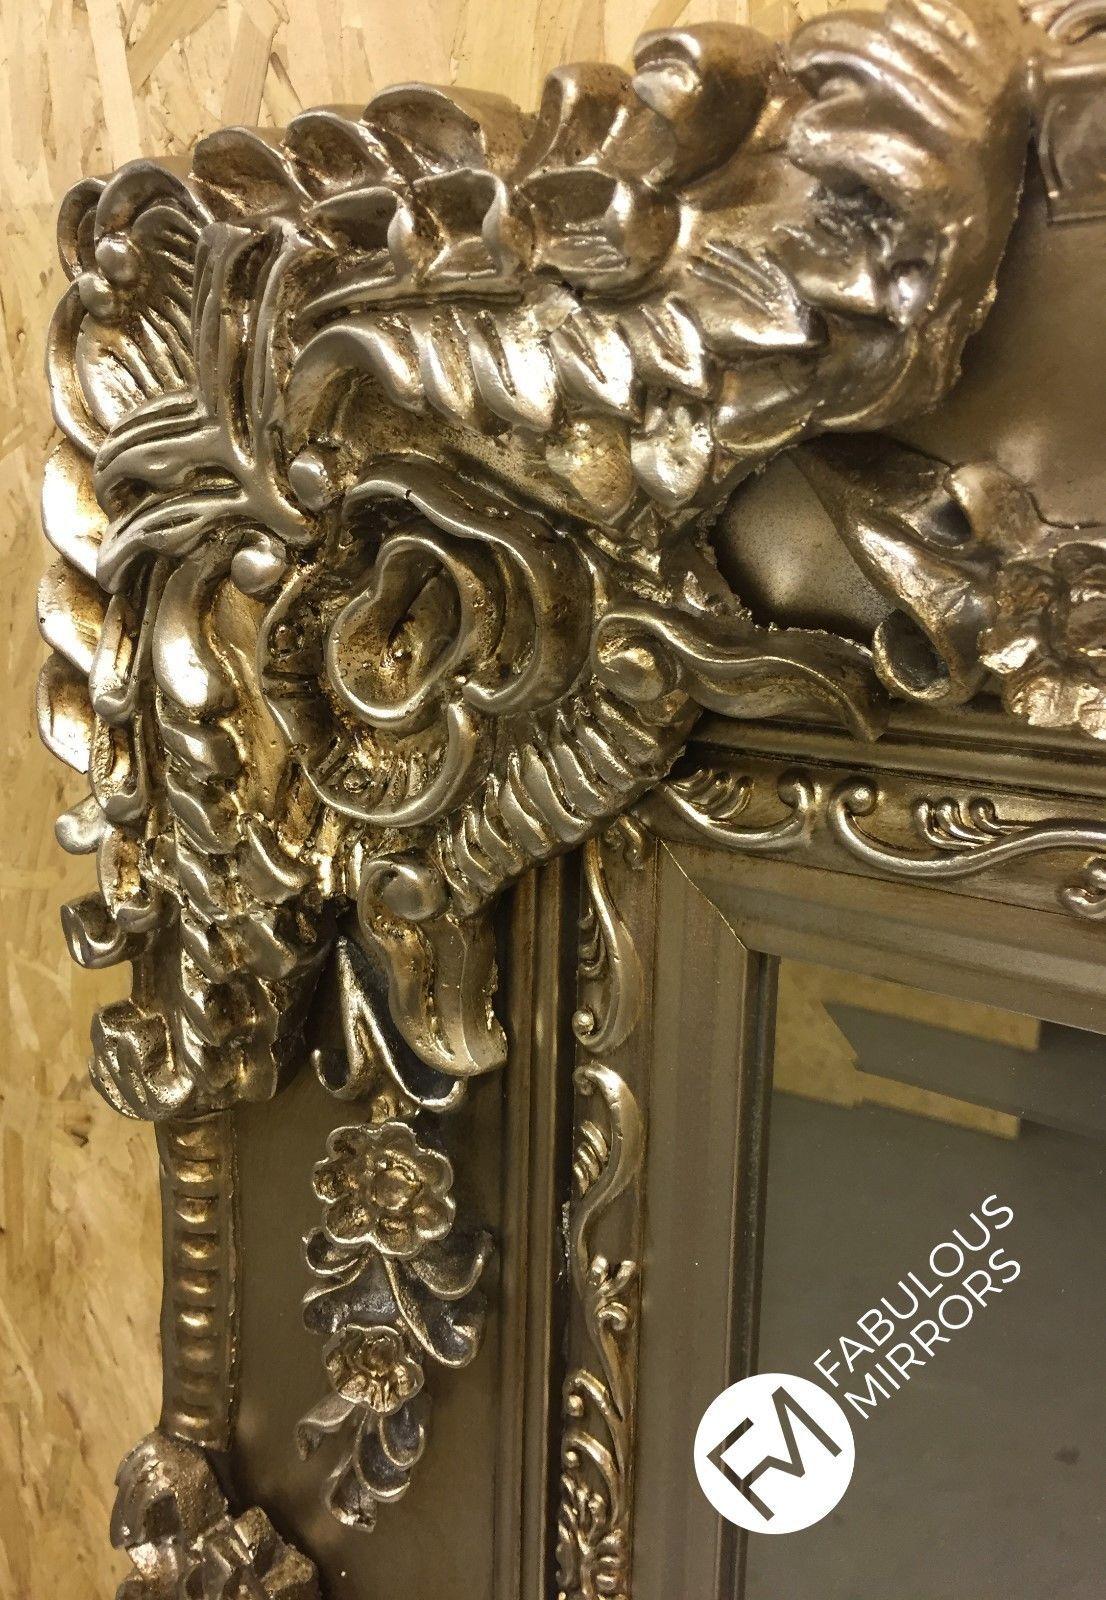 Large Antique Silver Ornate Regal Decorative Mirror